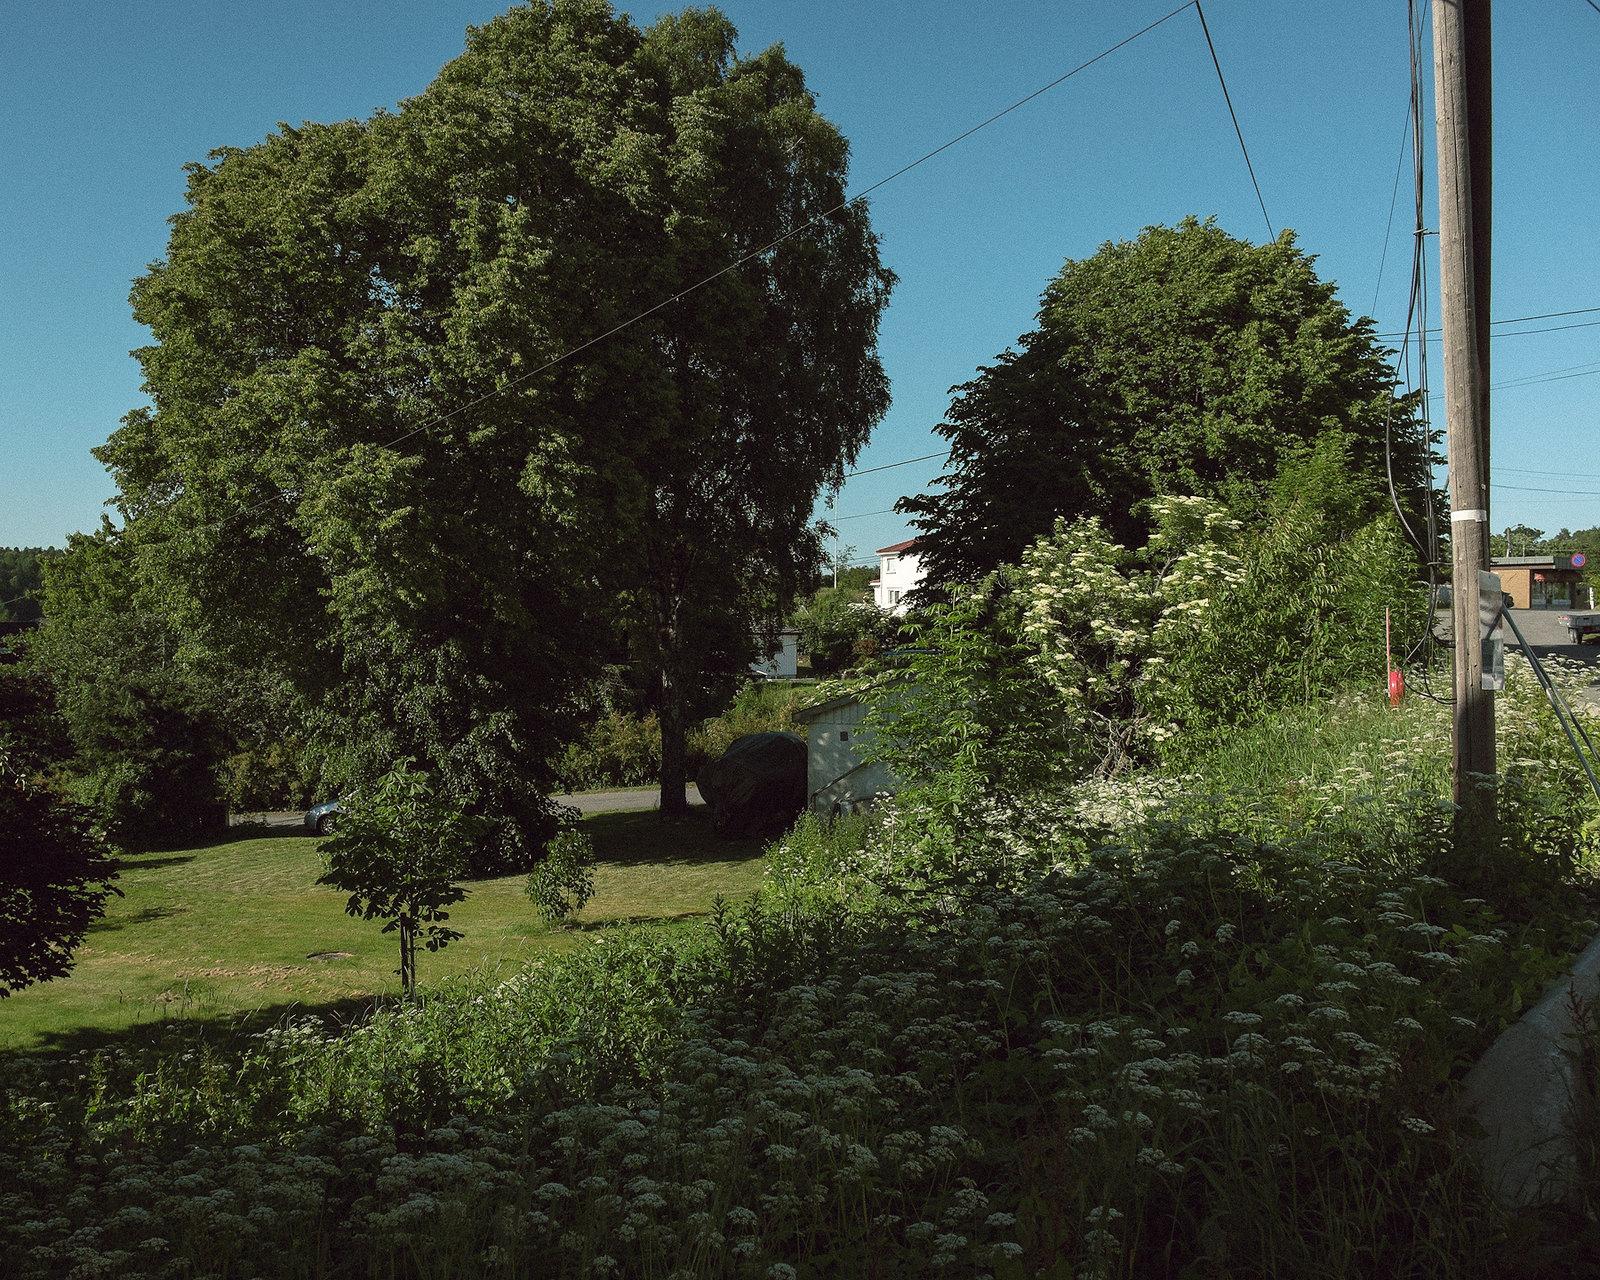 Summer, walking